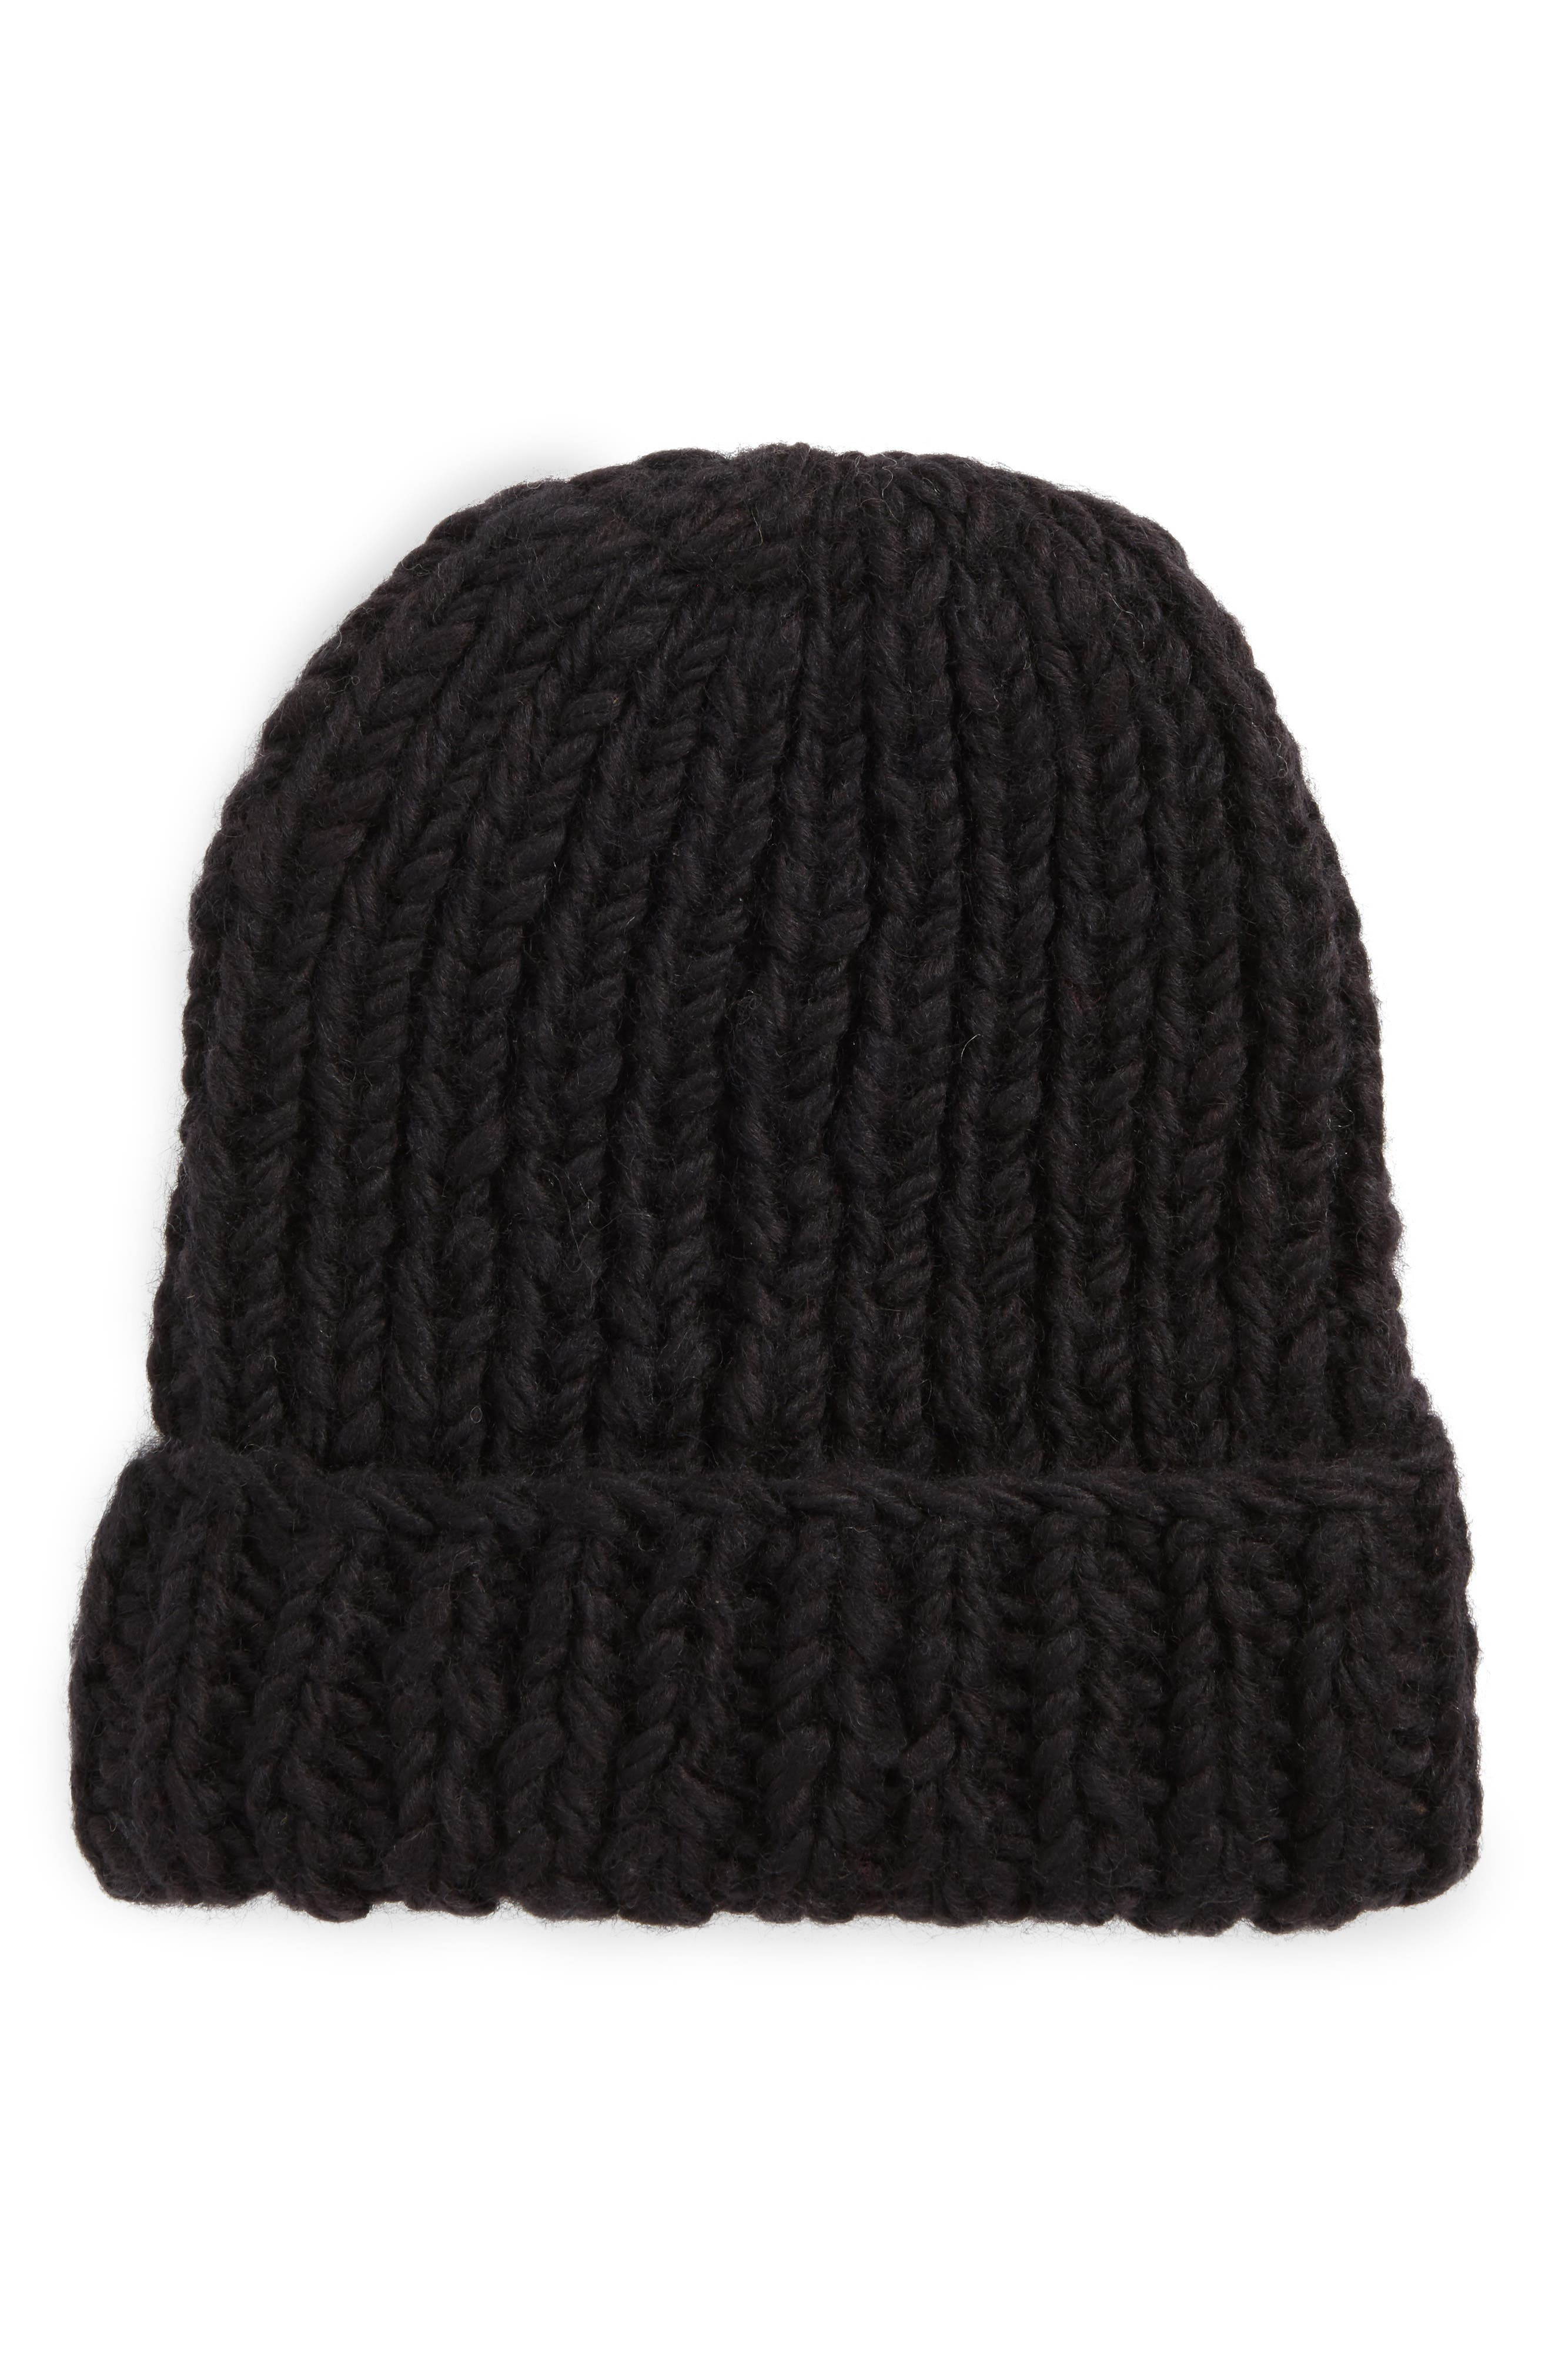 NIRVANNA DESIGNS, Chunky Knit Slouchy Wool Cap, Main thumbnail 1, color, 001